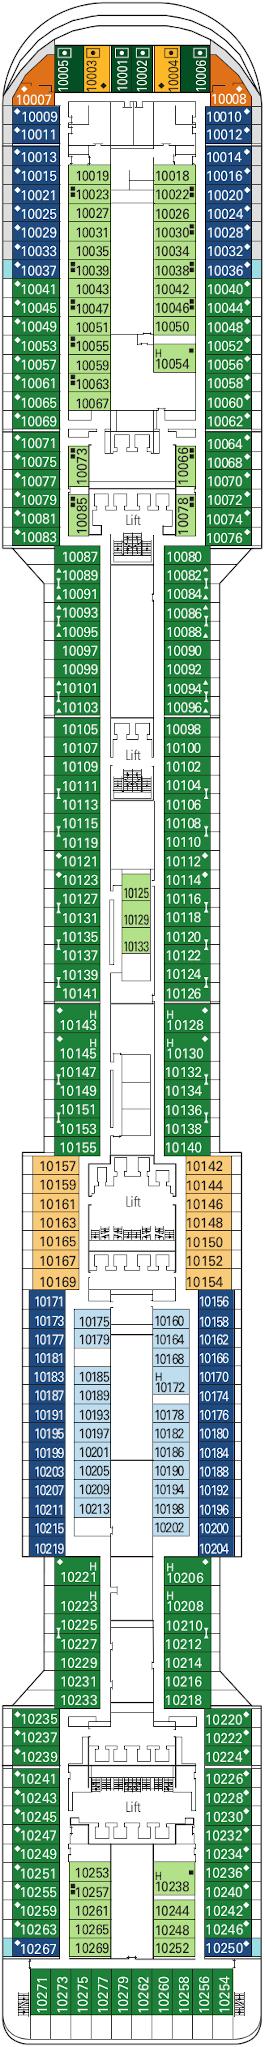 Msc Divina Giunone Deck Deck Plan